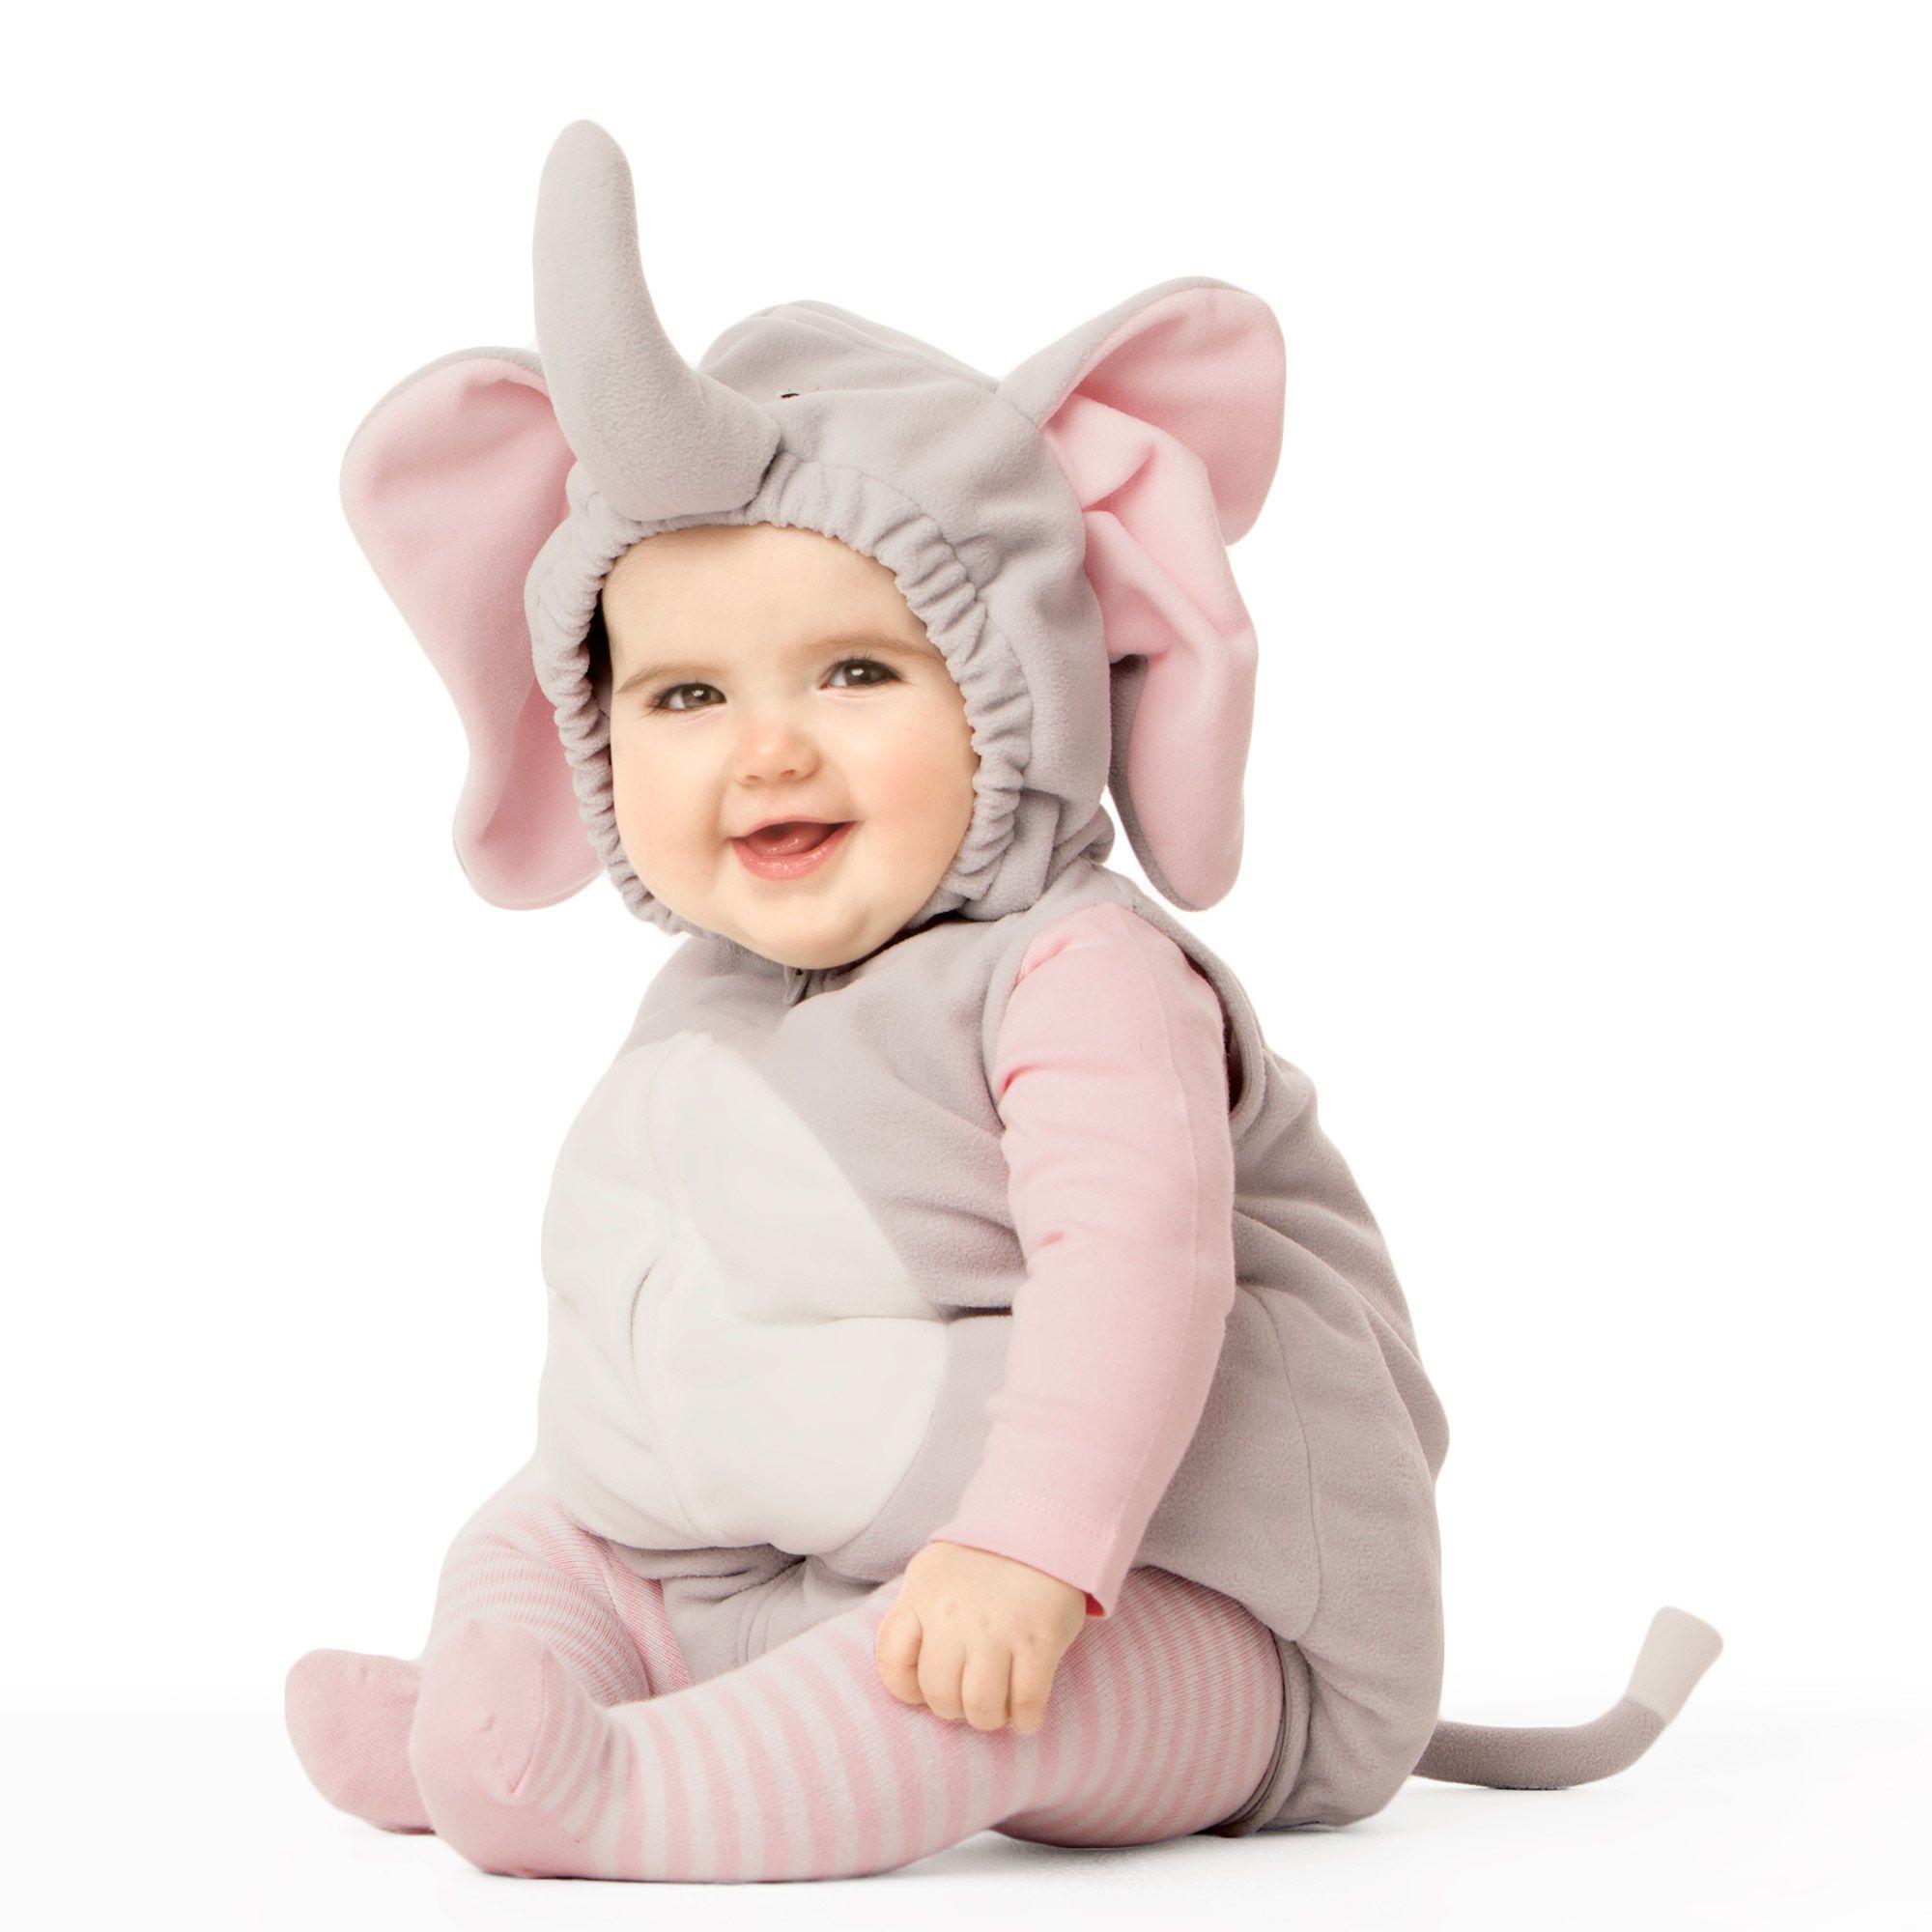 ab99e16e5012 Little Baby Elephant Halloween Costume